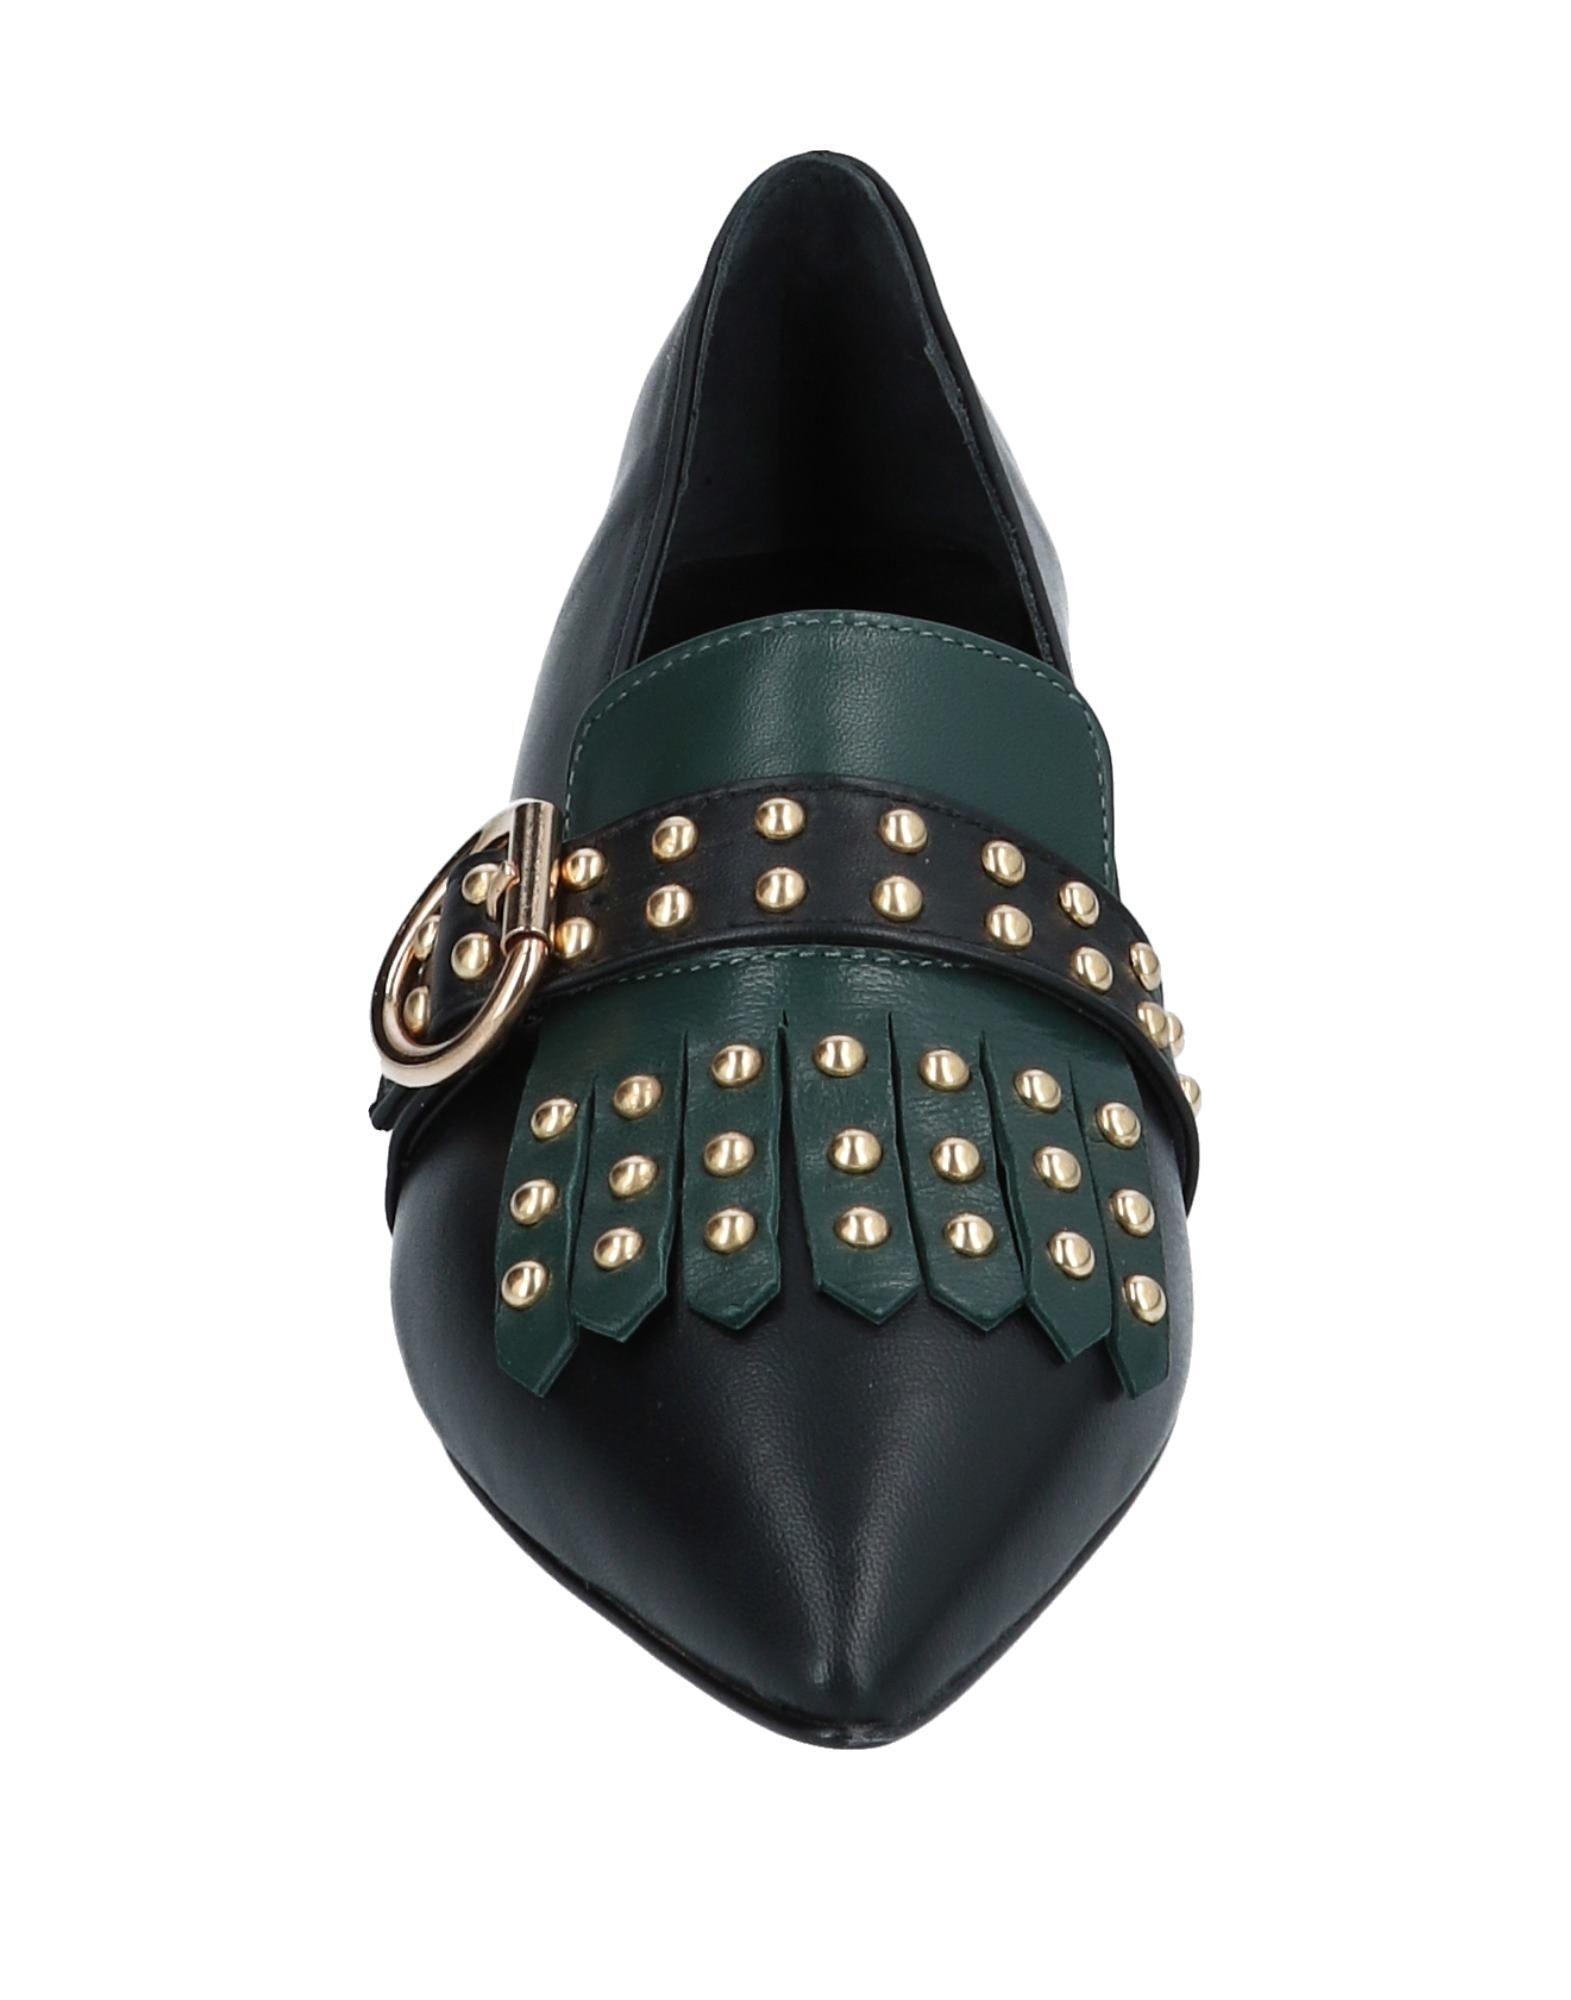 Stilvolle Mokassins billige Schuhe Griff Italia Mokassins Stilvolle Damen  11559252AH c96a36